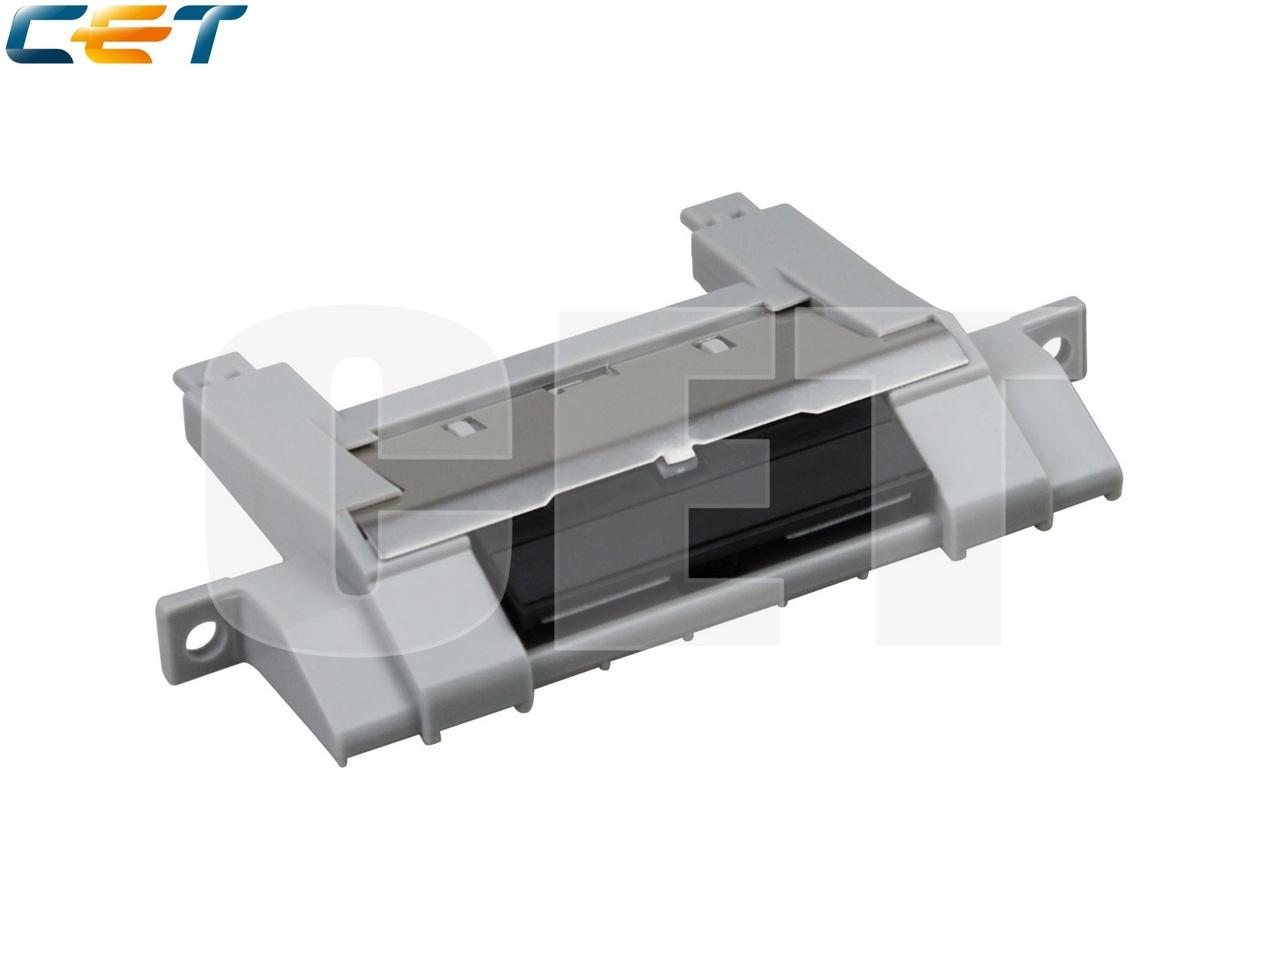 Тормозная площадка 2-го лотка RM1-6303-000 для HP LaserJetEnterprise P3015, M521/M525 (CET), CET2425, CET2425R